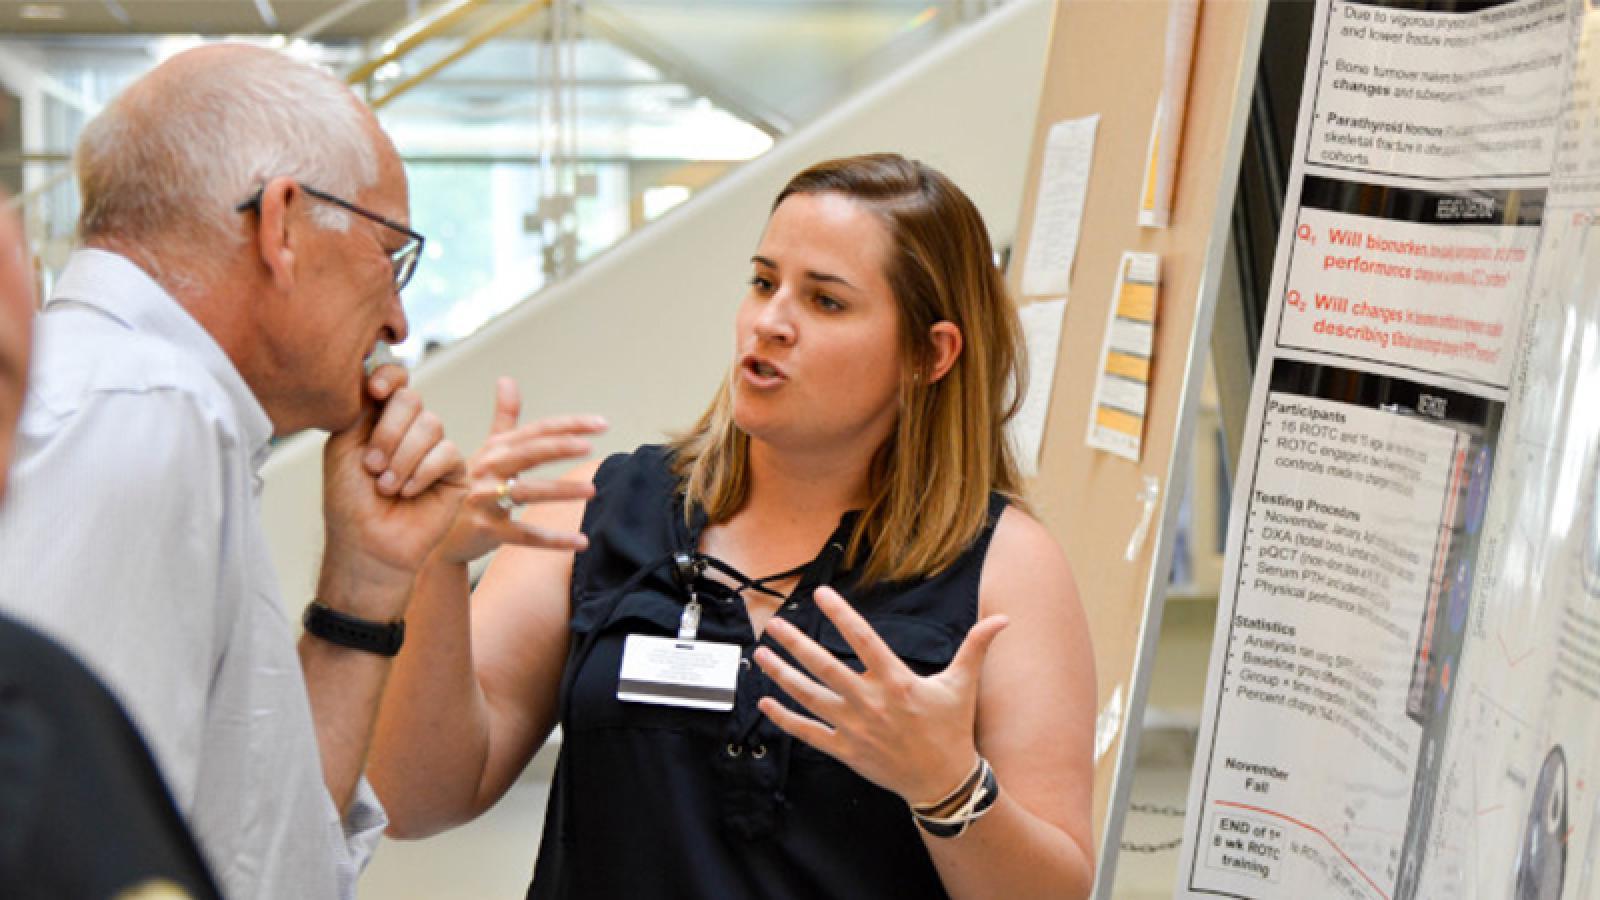 Bree Baker, a postdoctoral fellow on the Skeletal Morphology Team